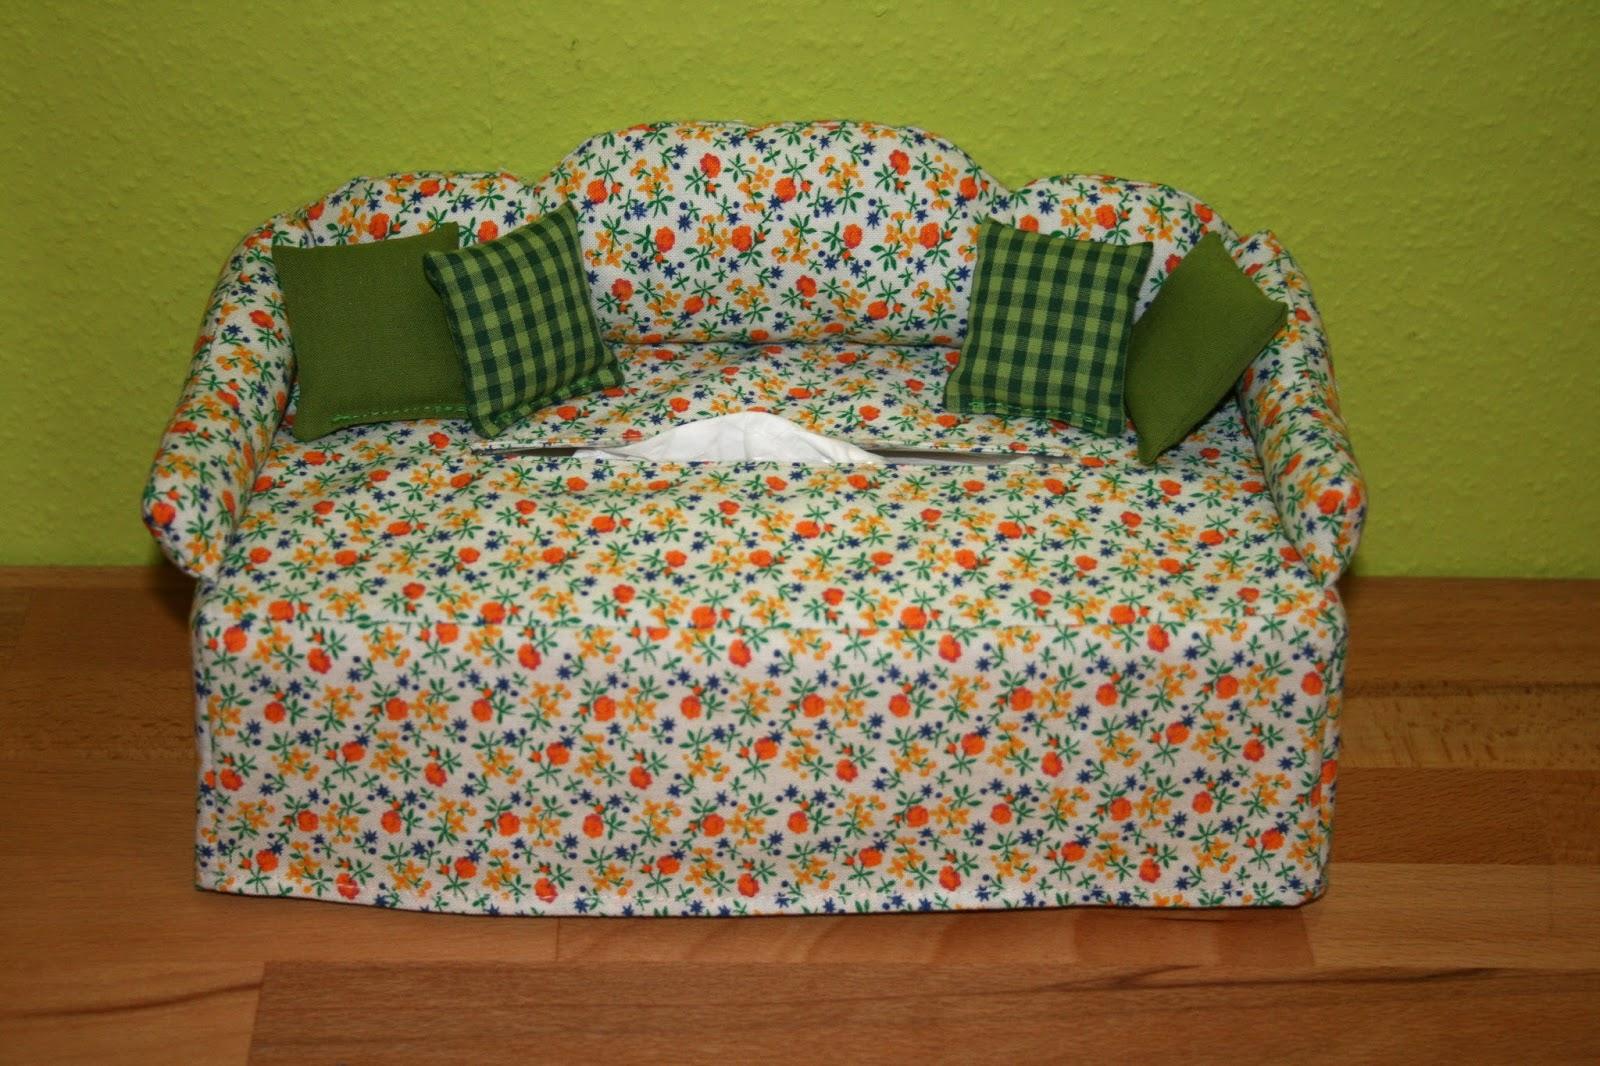 alles selbstgenaeht anleitung kleenex sofa. Black Bedroom Furniture Sets. Home Design Ideas